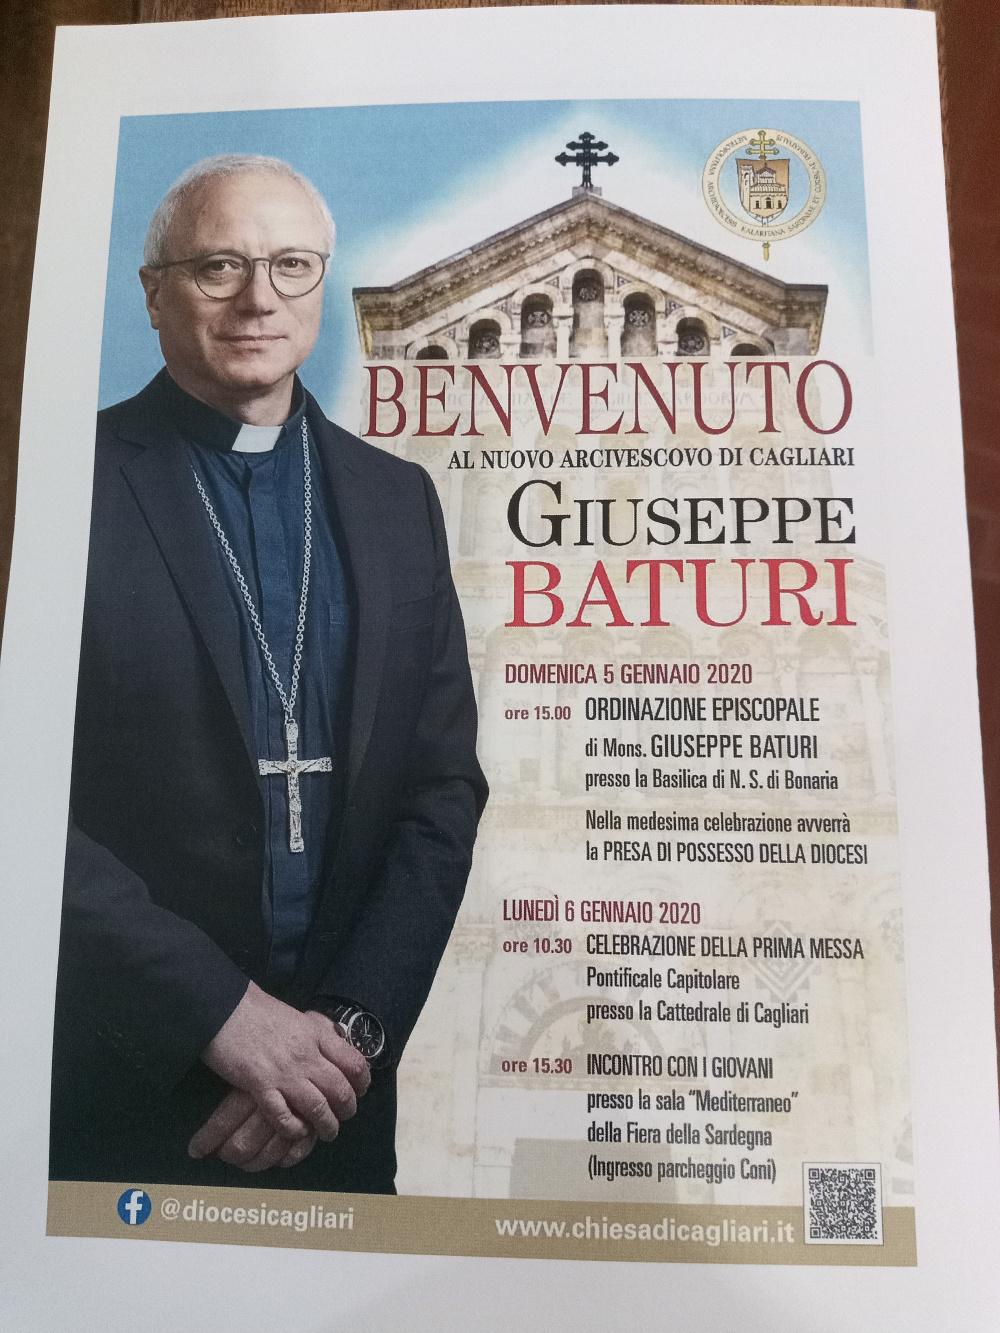 Giuseppe Butari